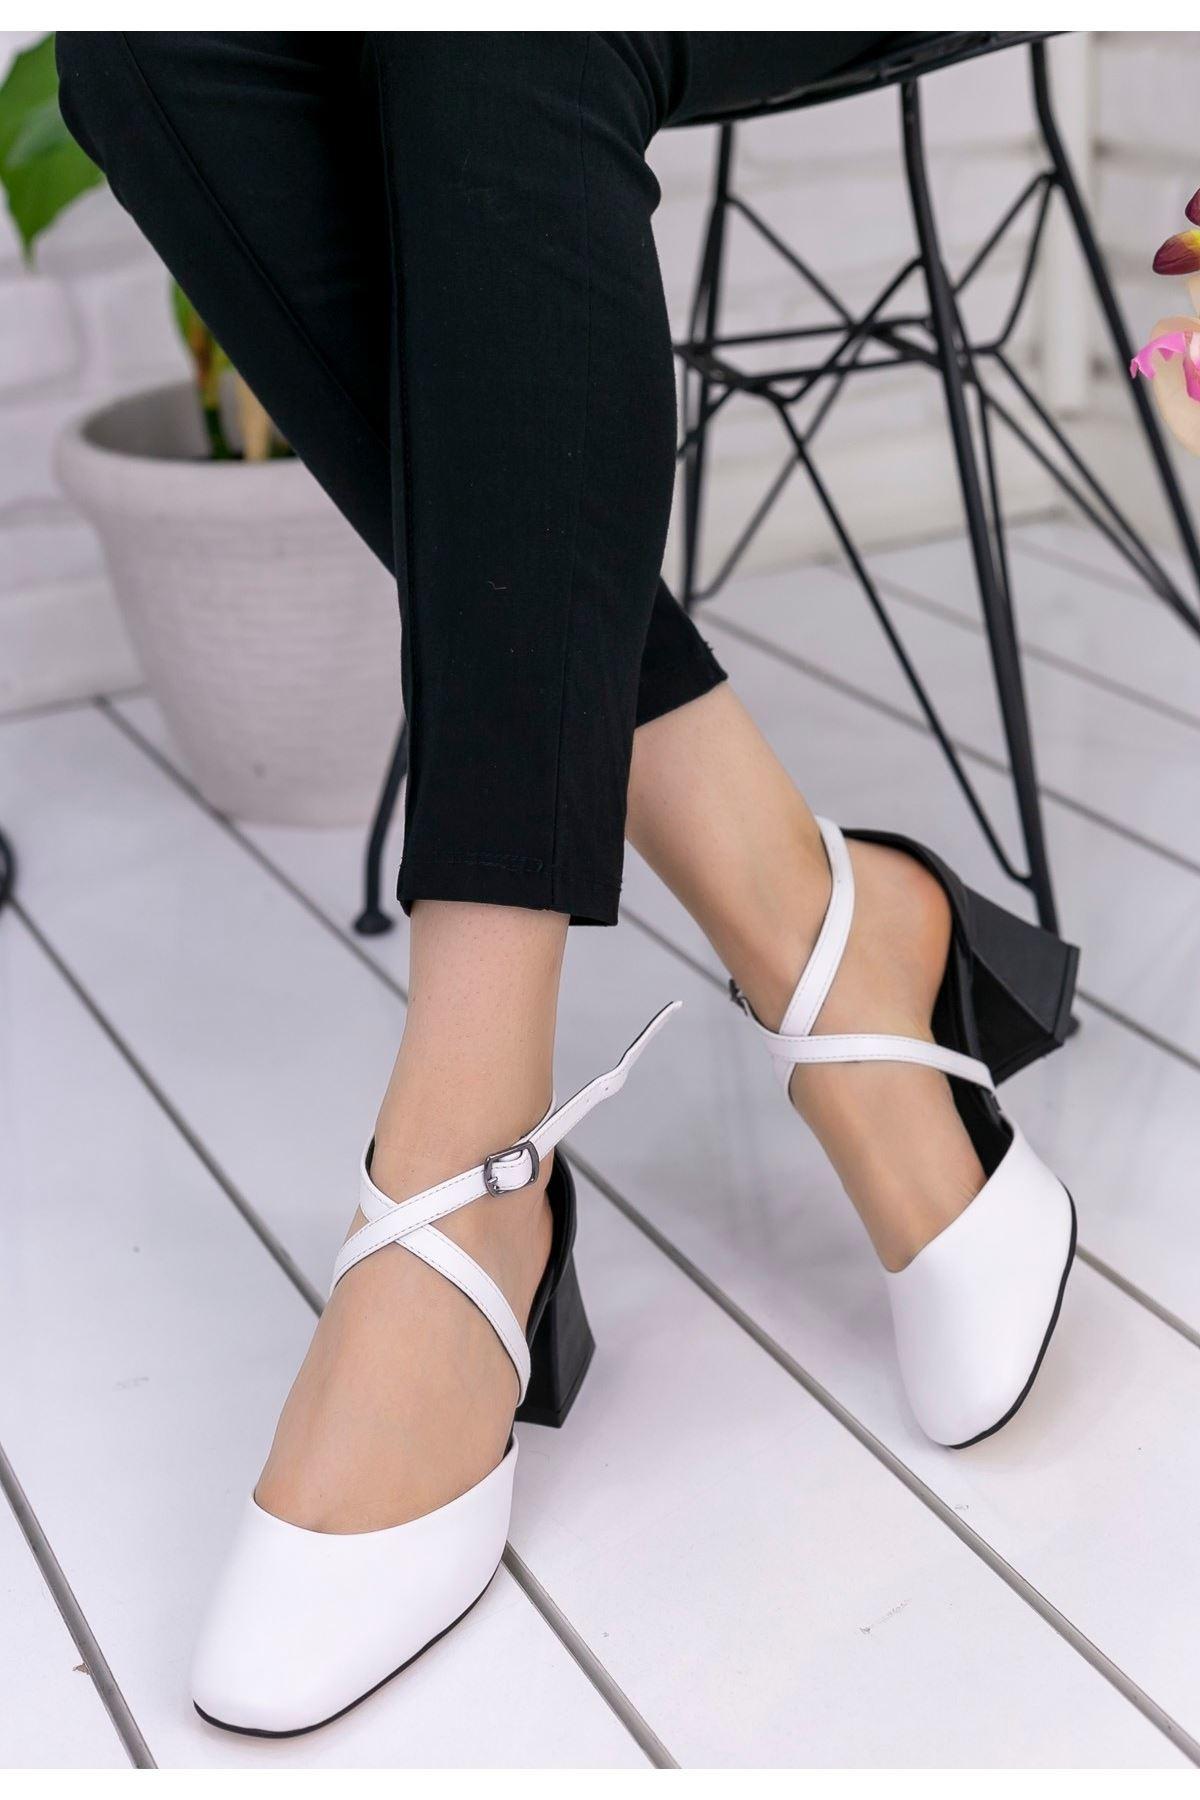 Londa Beyaz Cilt Siyah Topuklu Ayakkabı